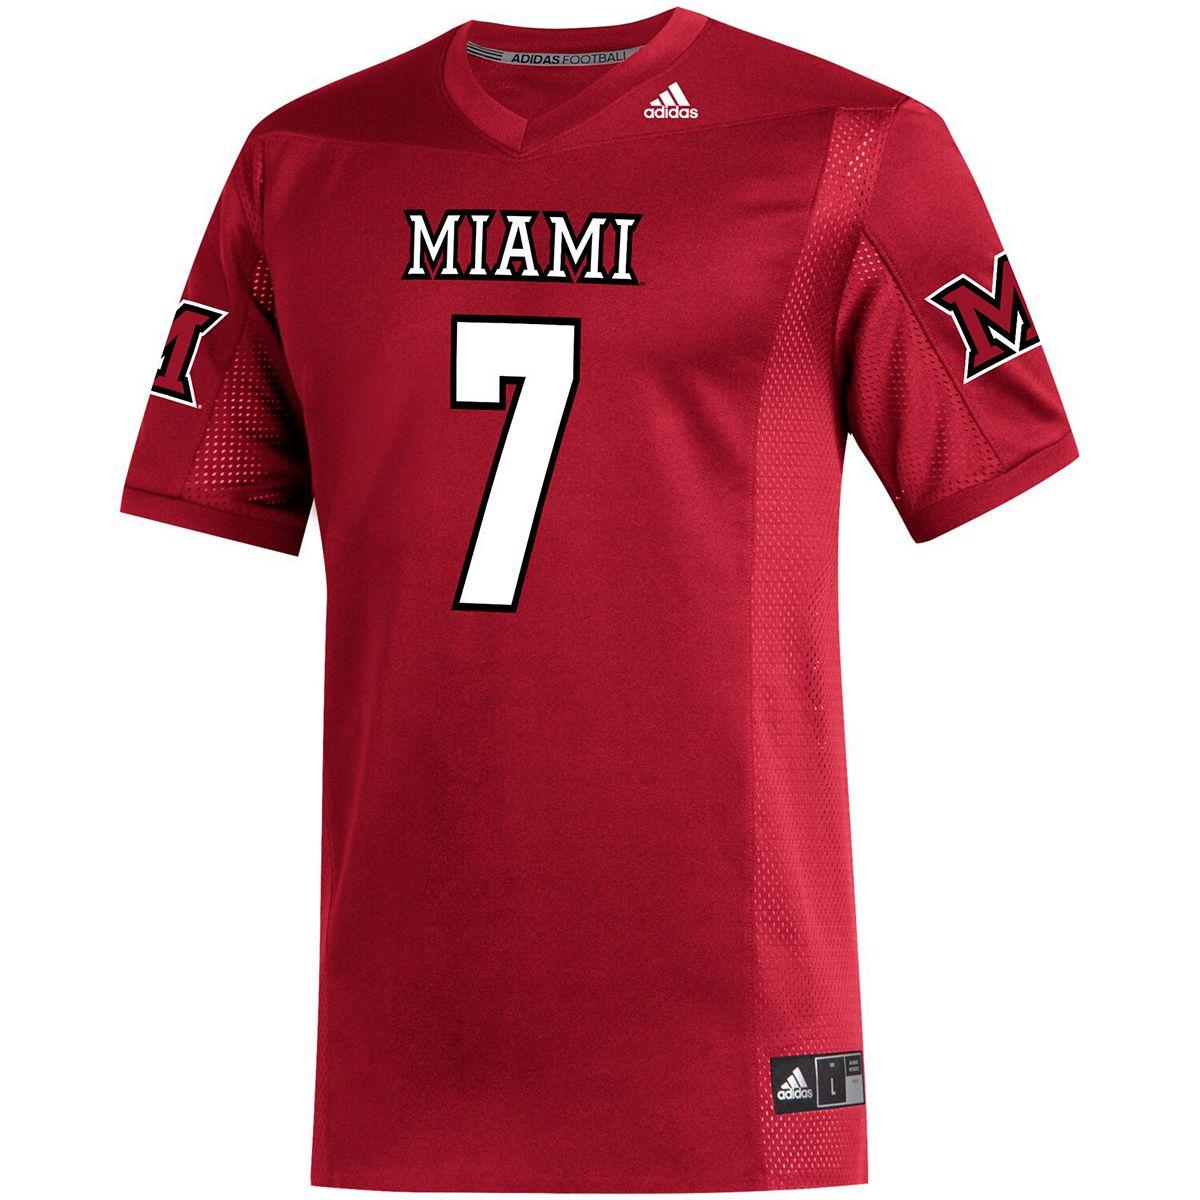 Men's adidas Ben Roethlisberger Red Miami University RedHawks Alumni Replica Football Jersey rulb0